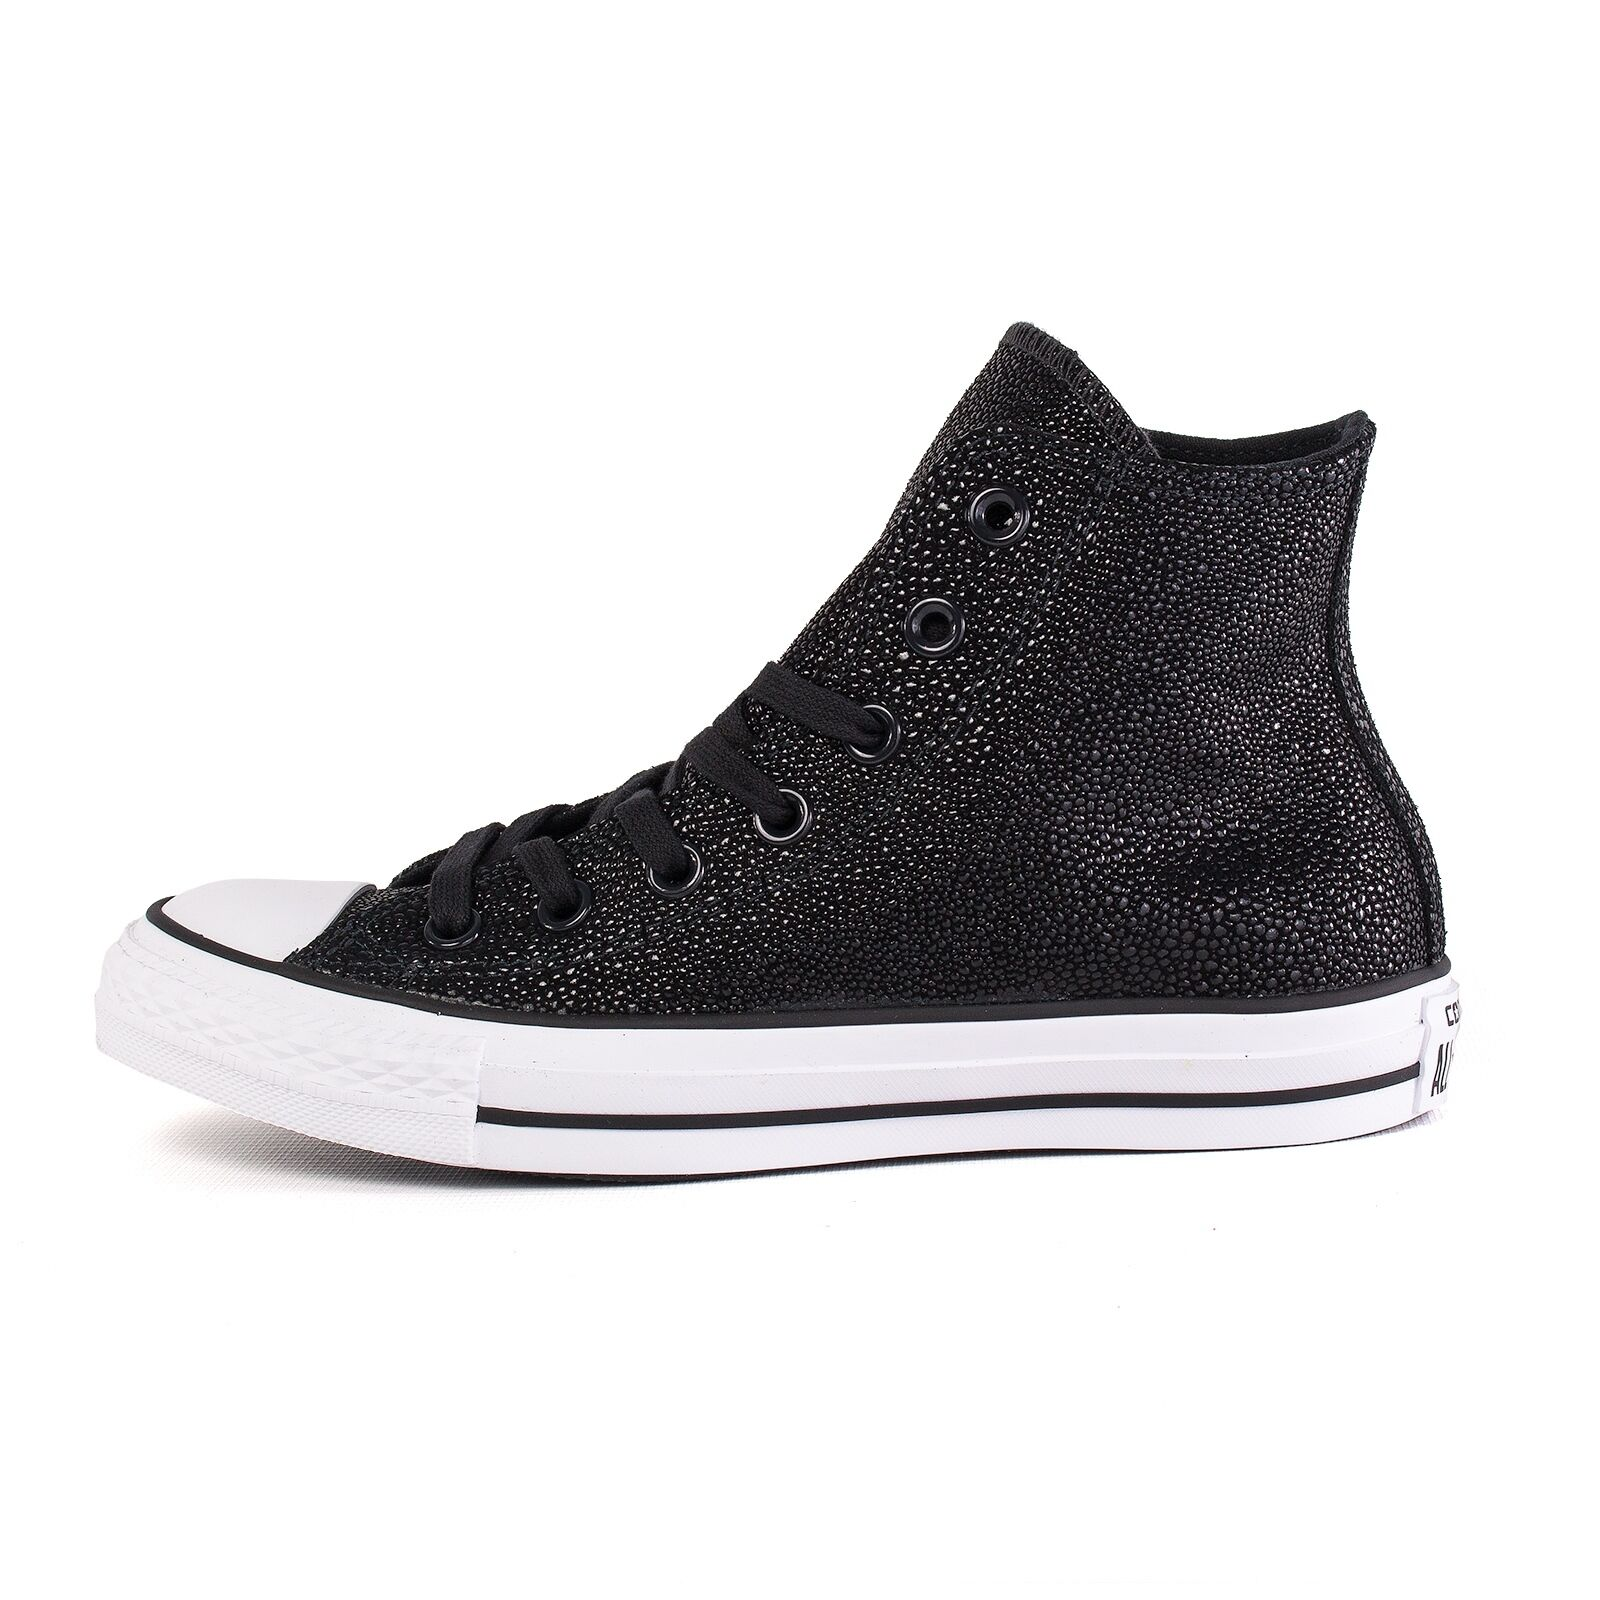 Converse All Star Chuck ctas Stingray mujer, metalizado Hi zapato de mujer, Stingray negro, 51163 743cb8